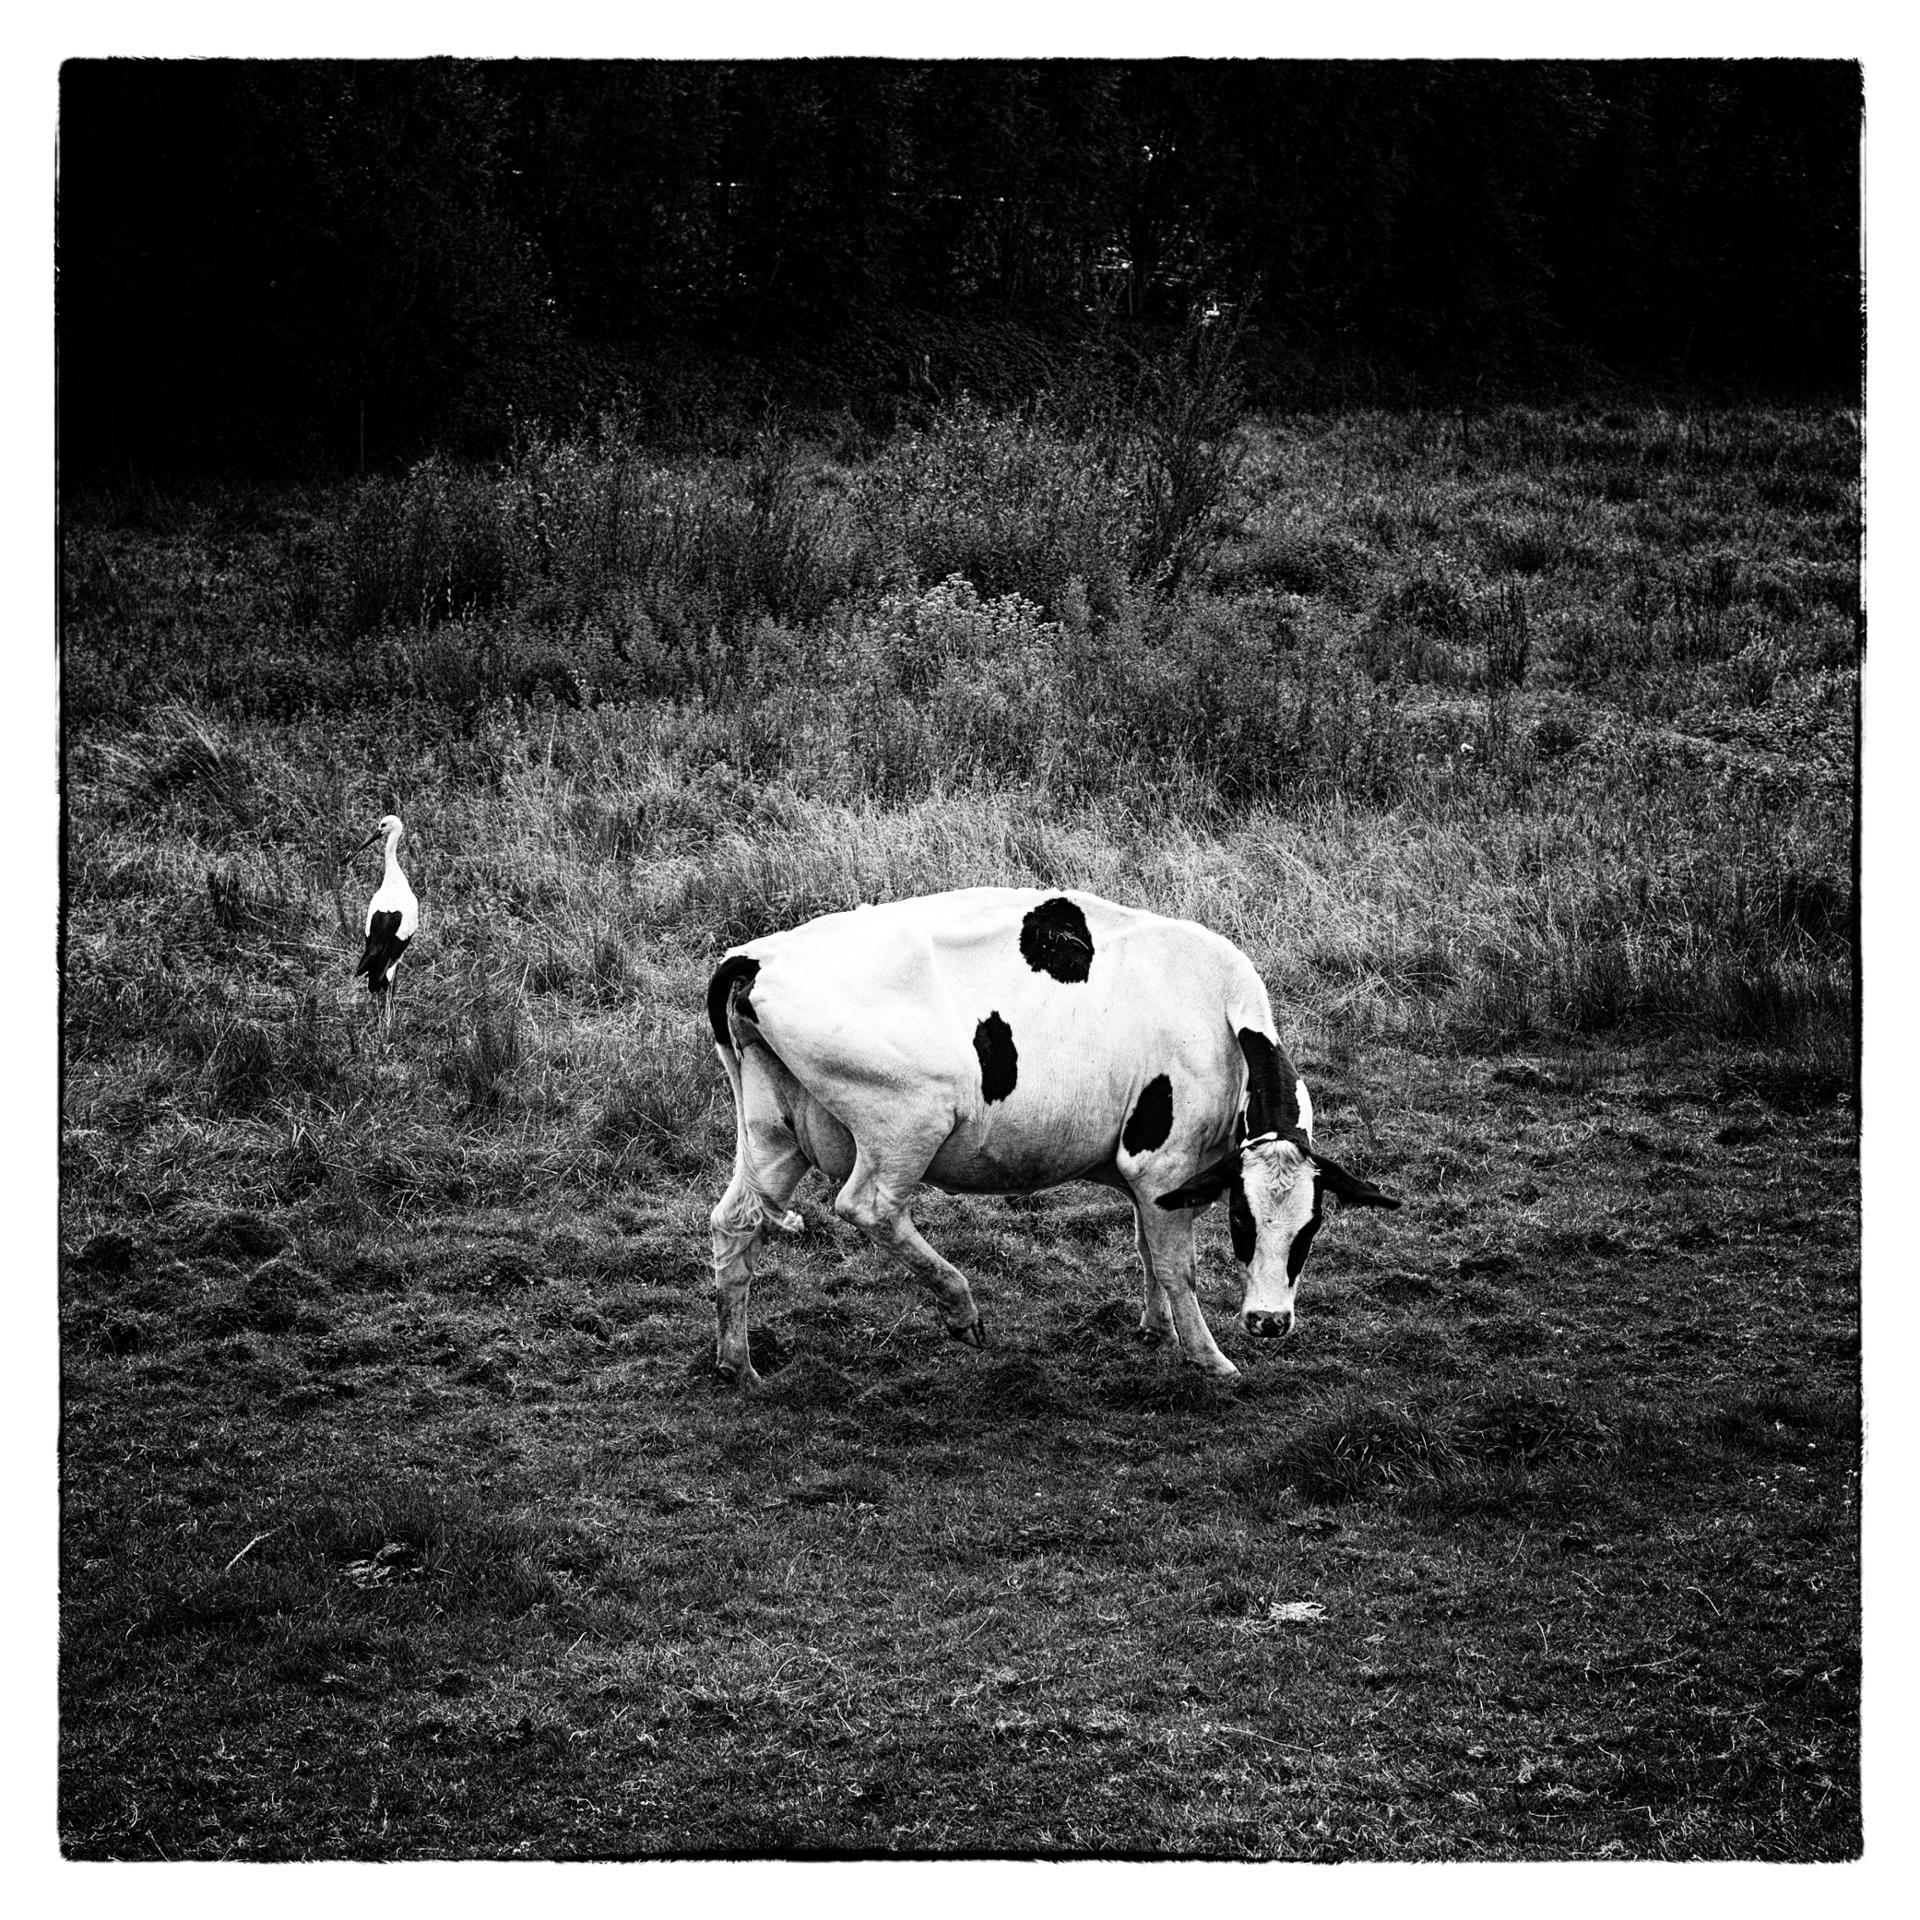 La vache et la cigogne